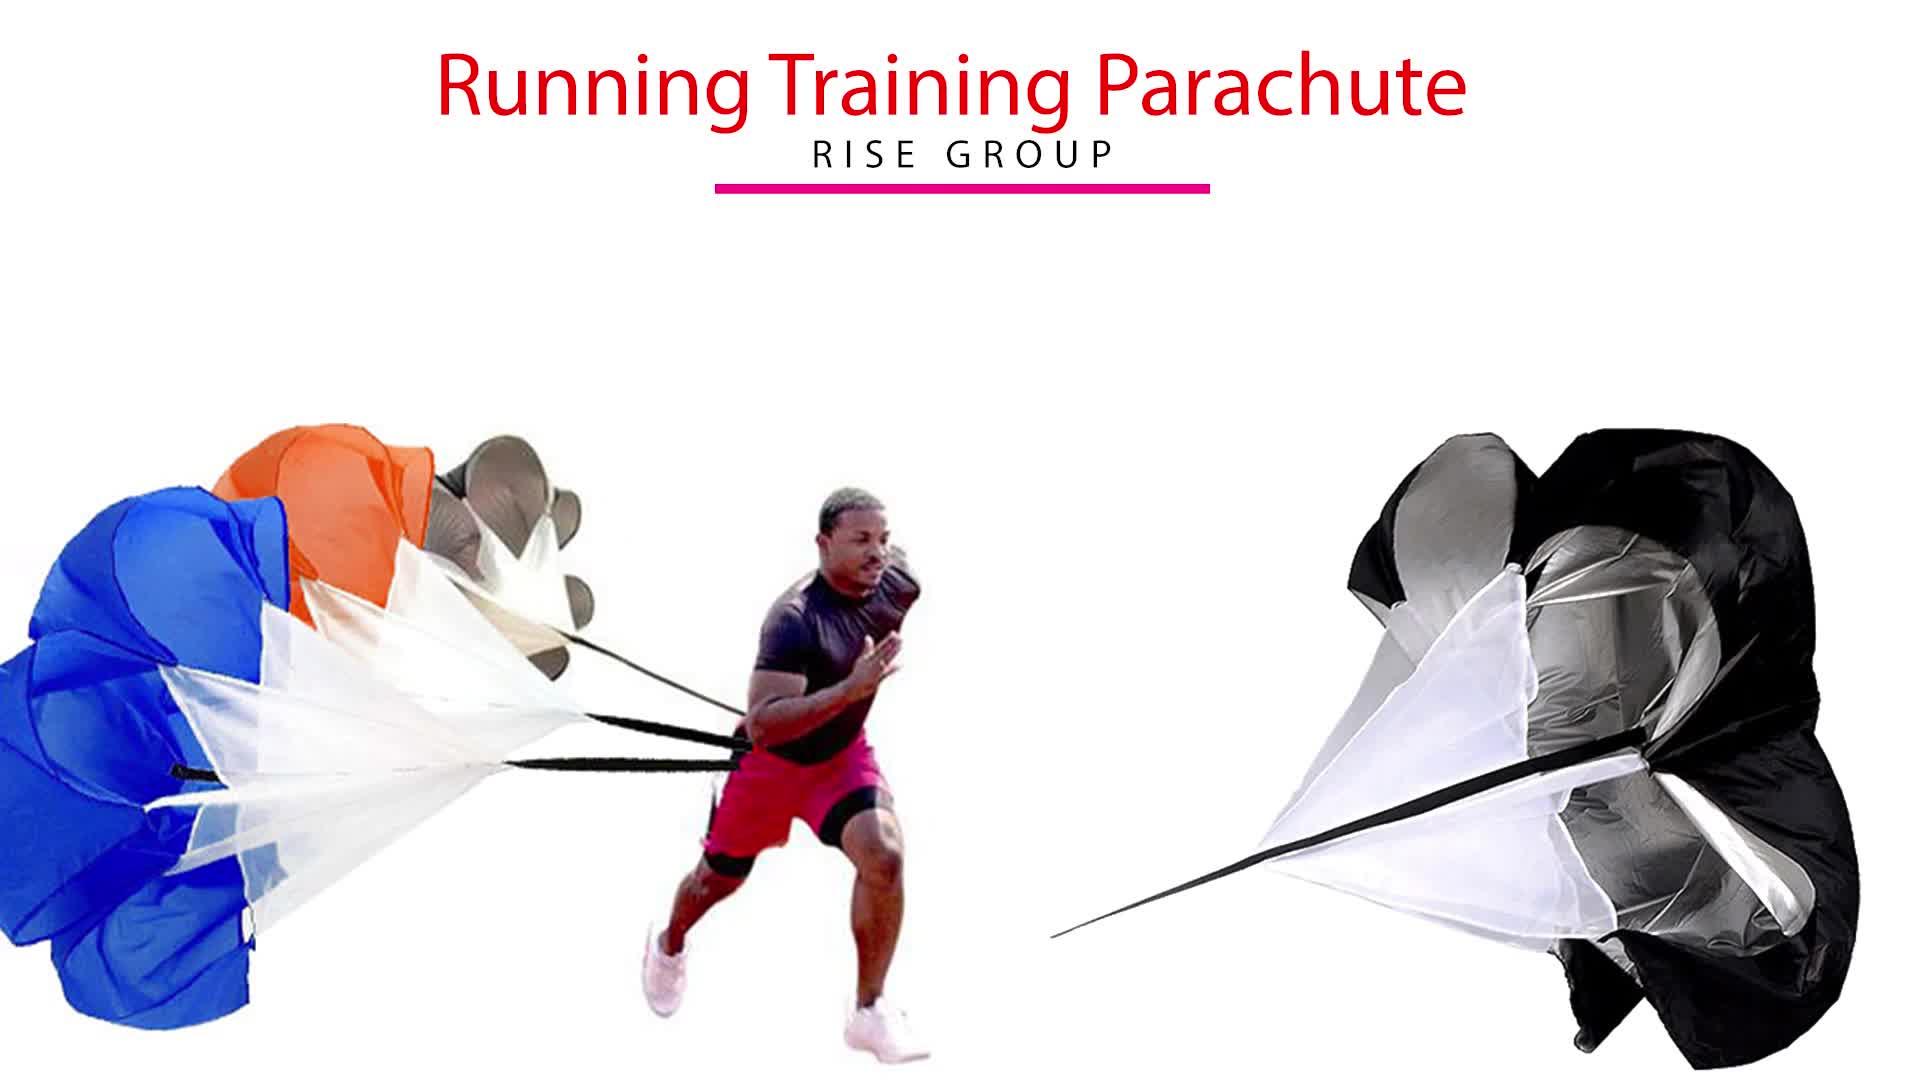 Running power e drogue addestramento di velocità paracadute